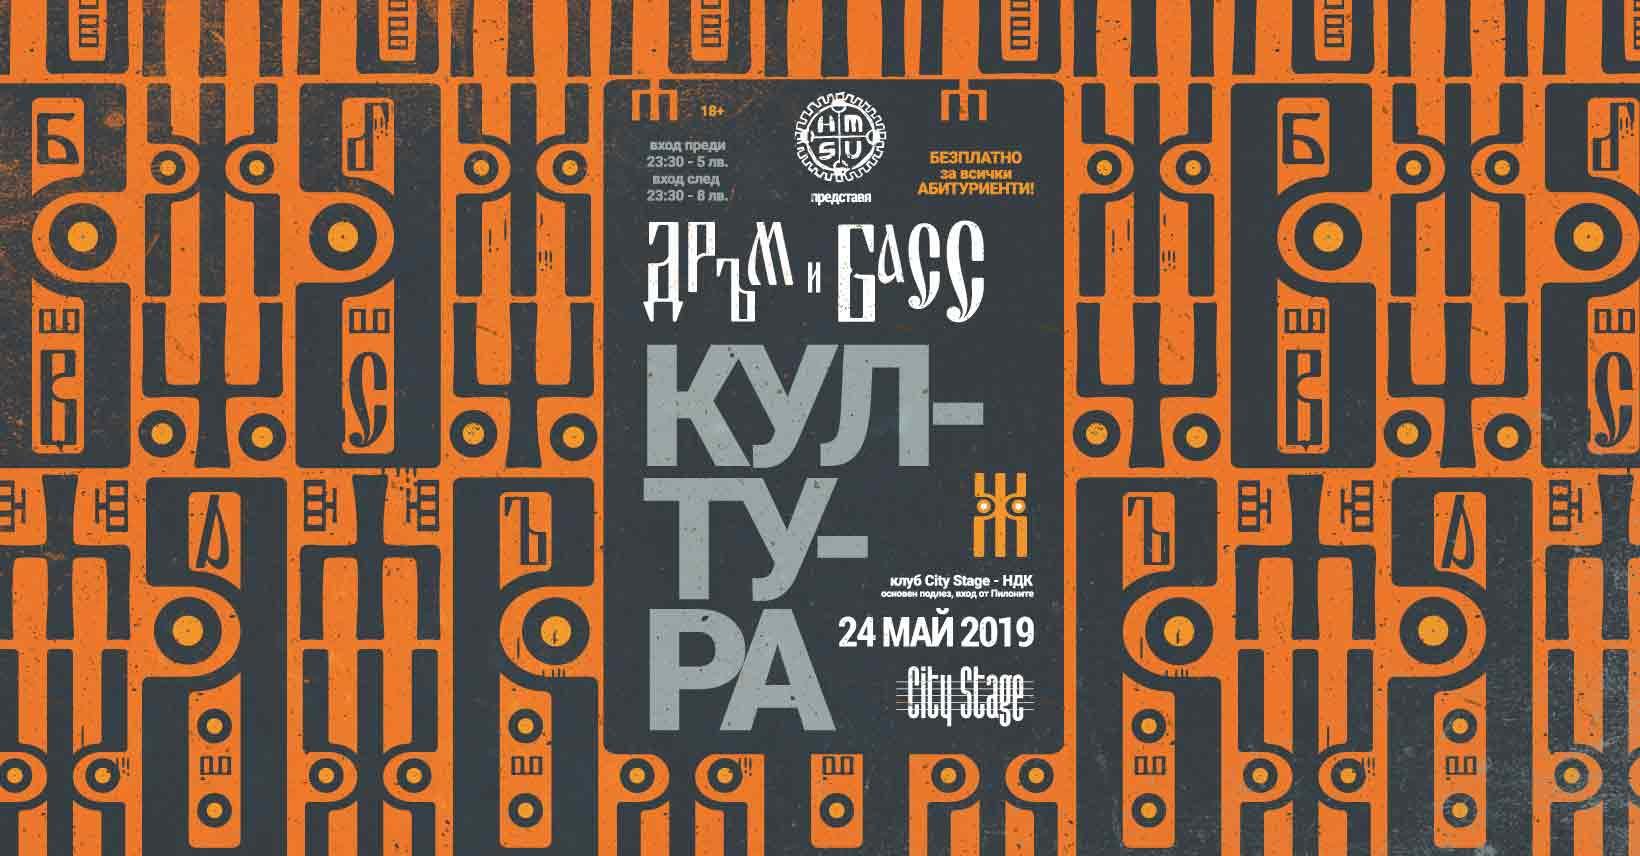 24 май 2019 г. 22:00 ч. City Stage | HMSU представя: ДРЪМ и БАСС Култура